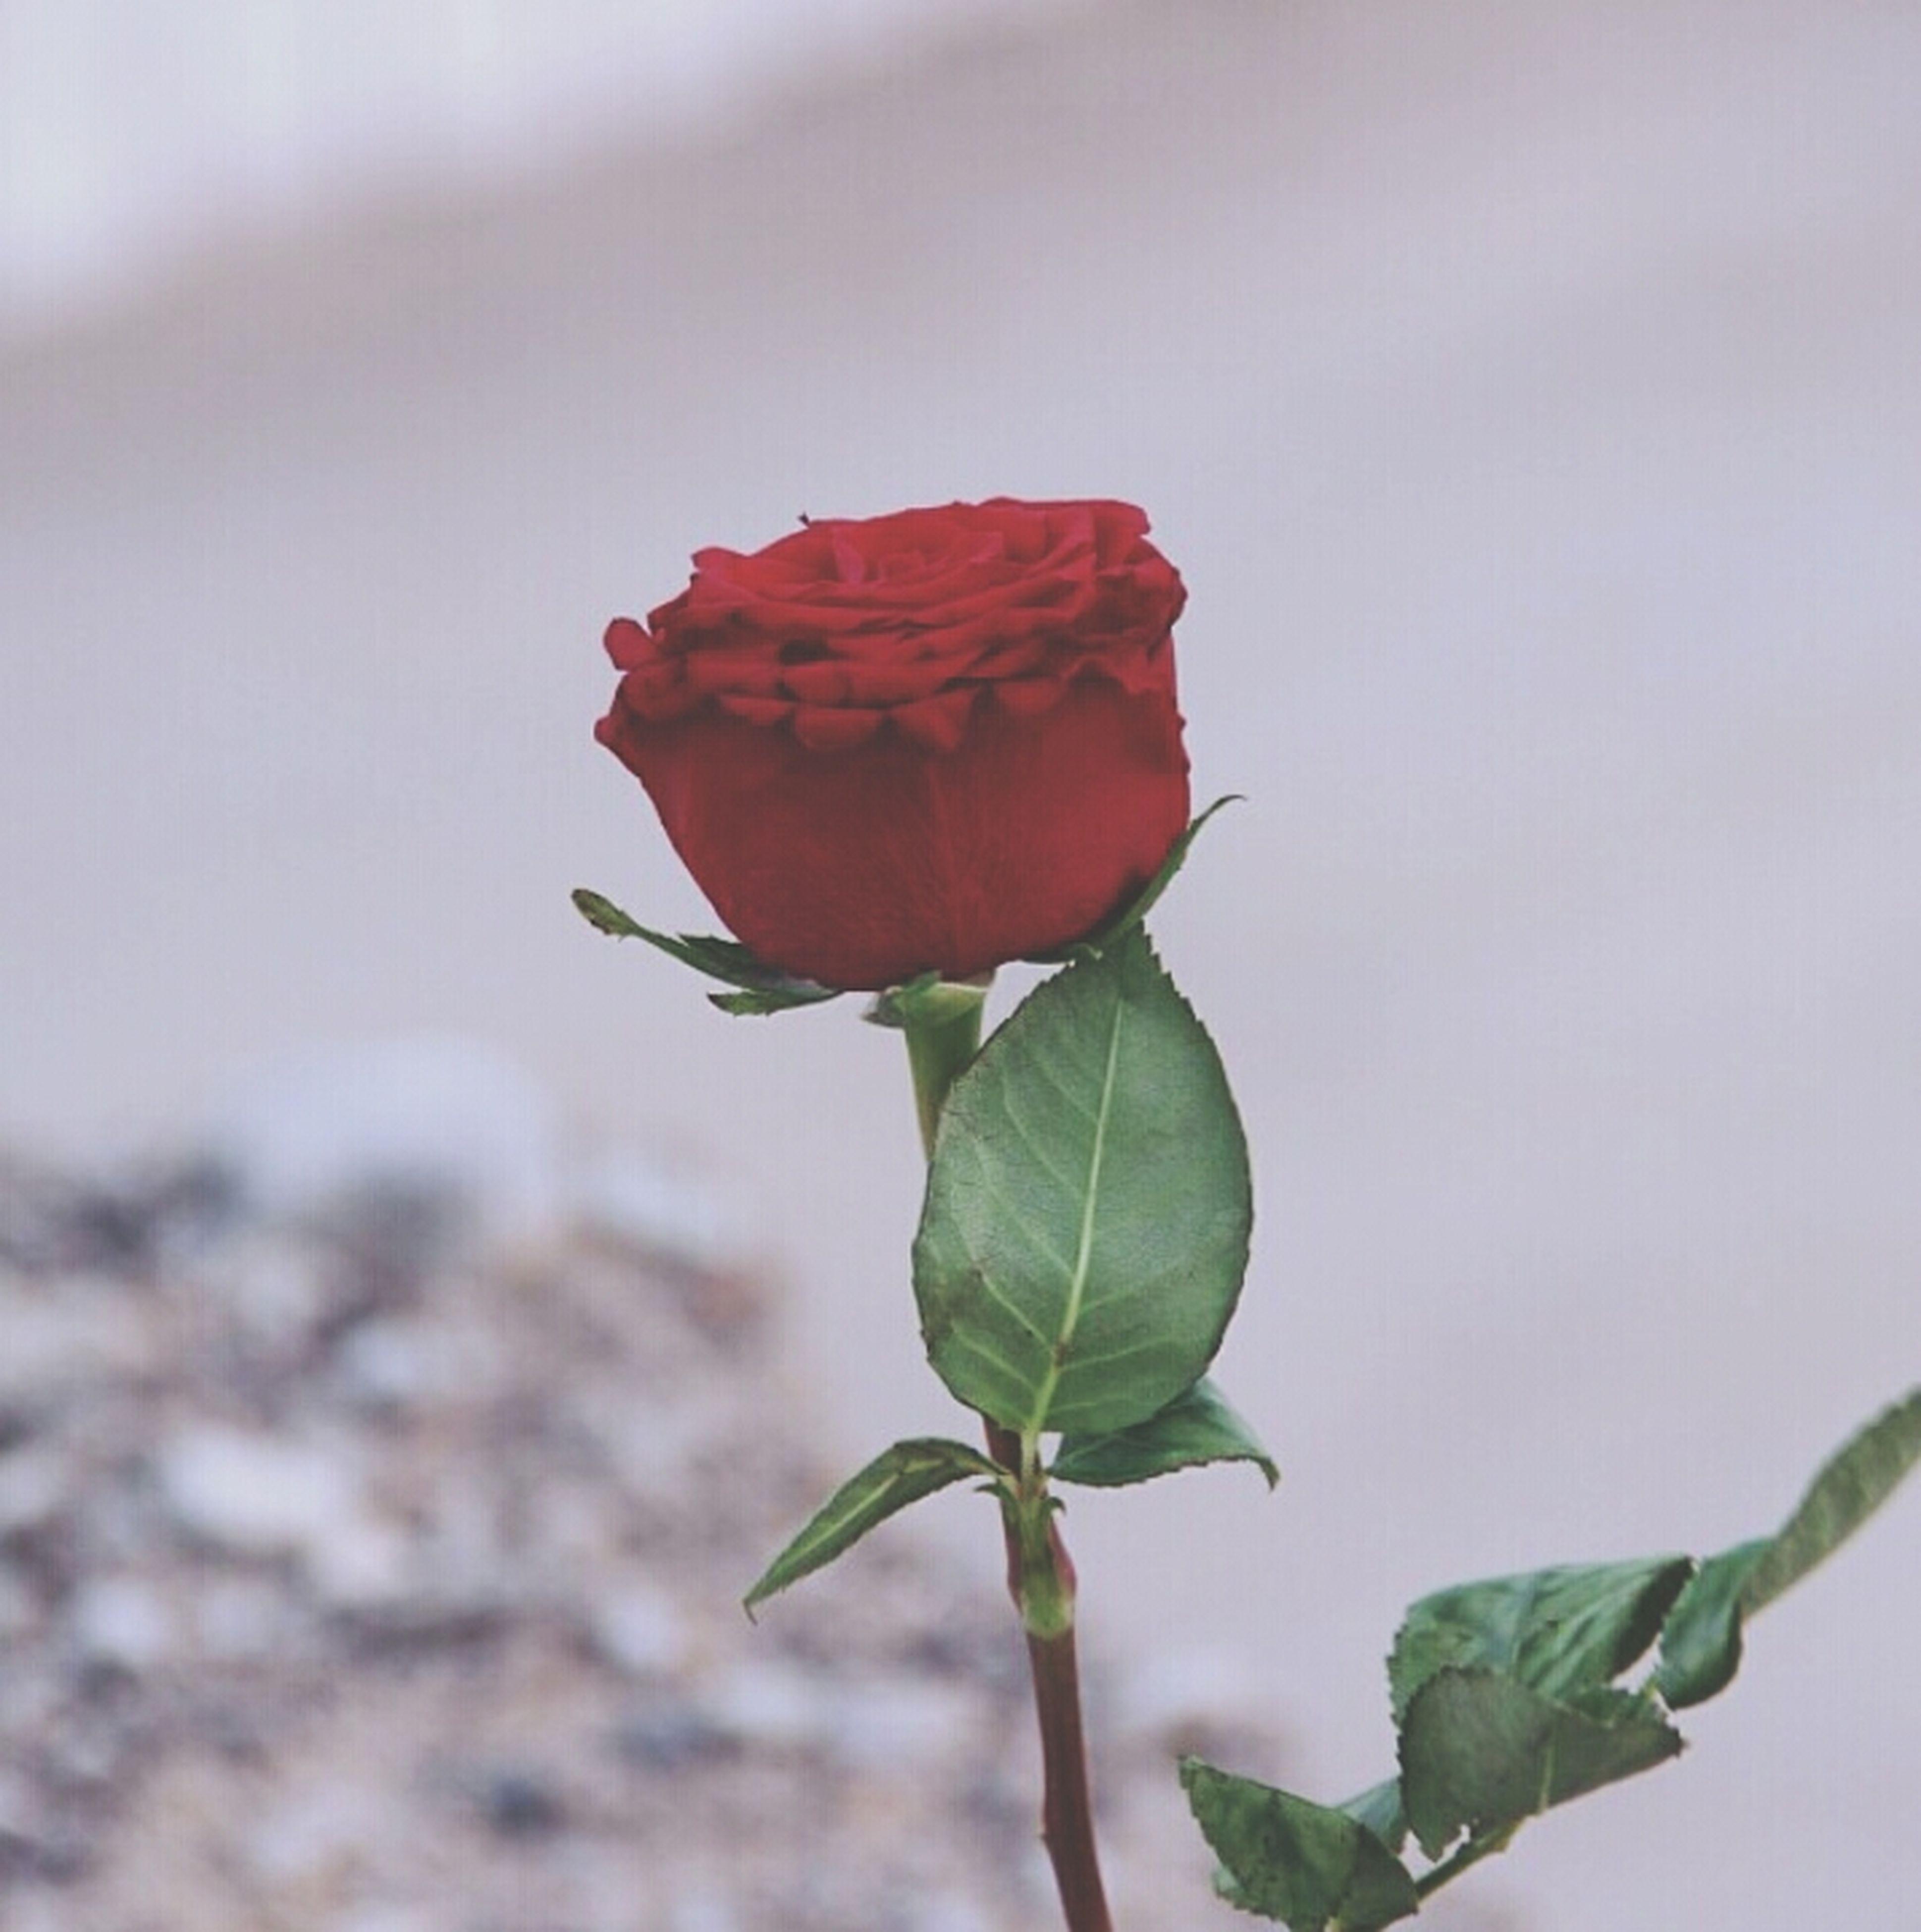 leaf, flower, fragility, rose - flower, close-up, petal, growth, freshness, red, plant, beauty in nature, flower head, nature, stem, single flower, focus on foreground, bud, rose, leaf vein, new life